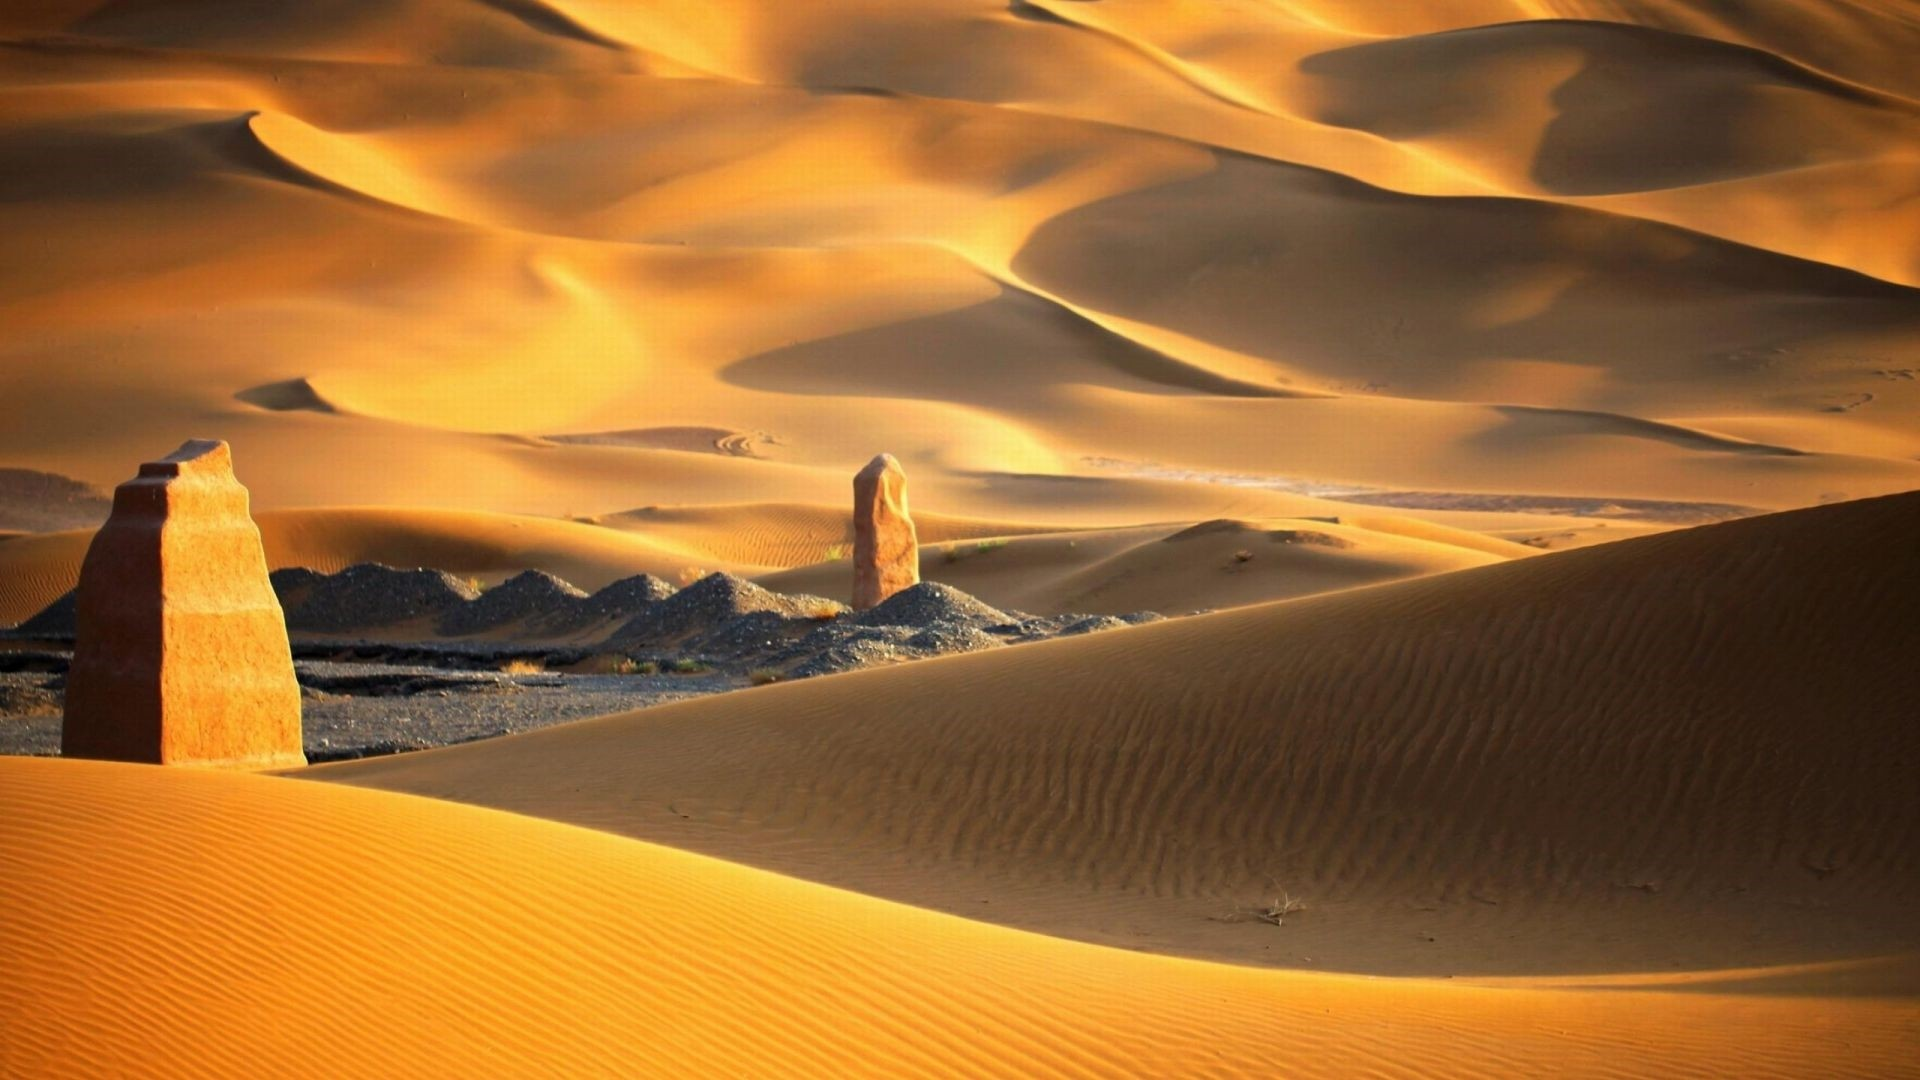 Sahara wallpaper photo hd